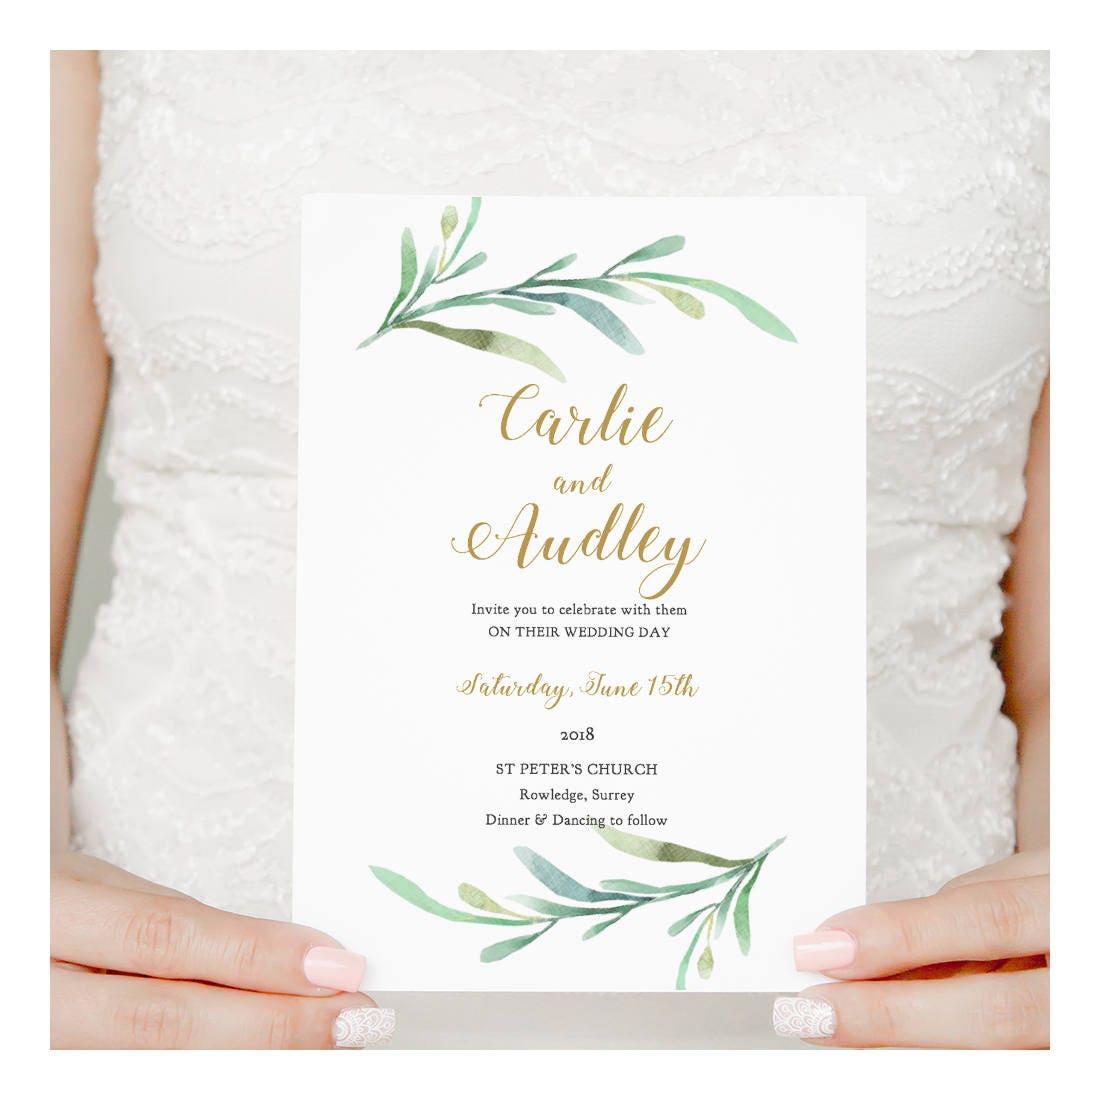 Greenery Wedding Invitation Template Garden Invitation